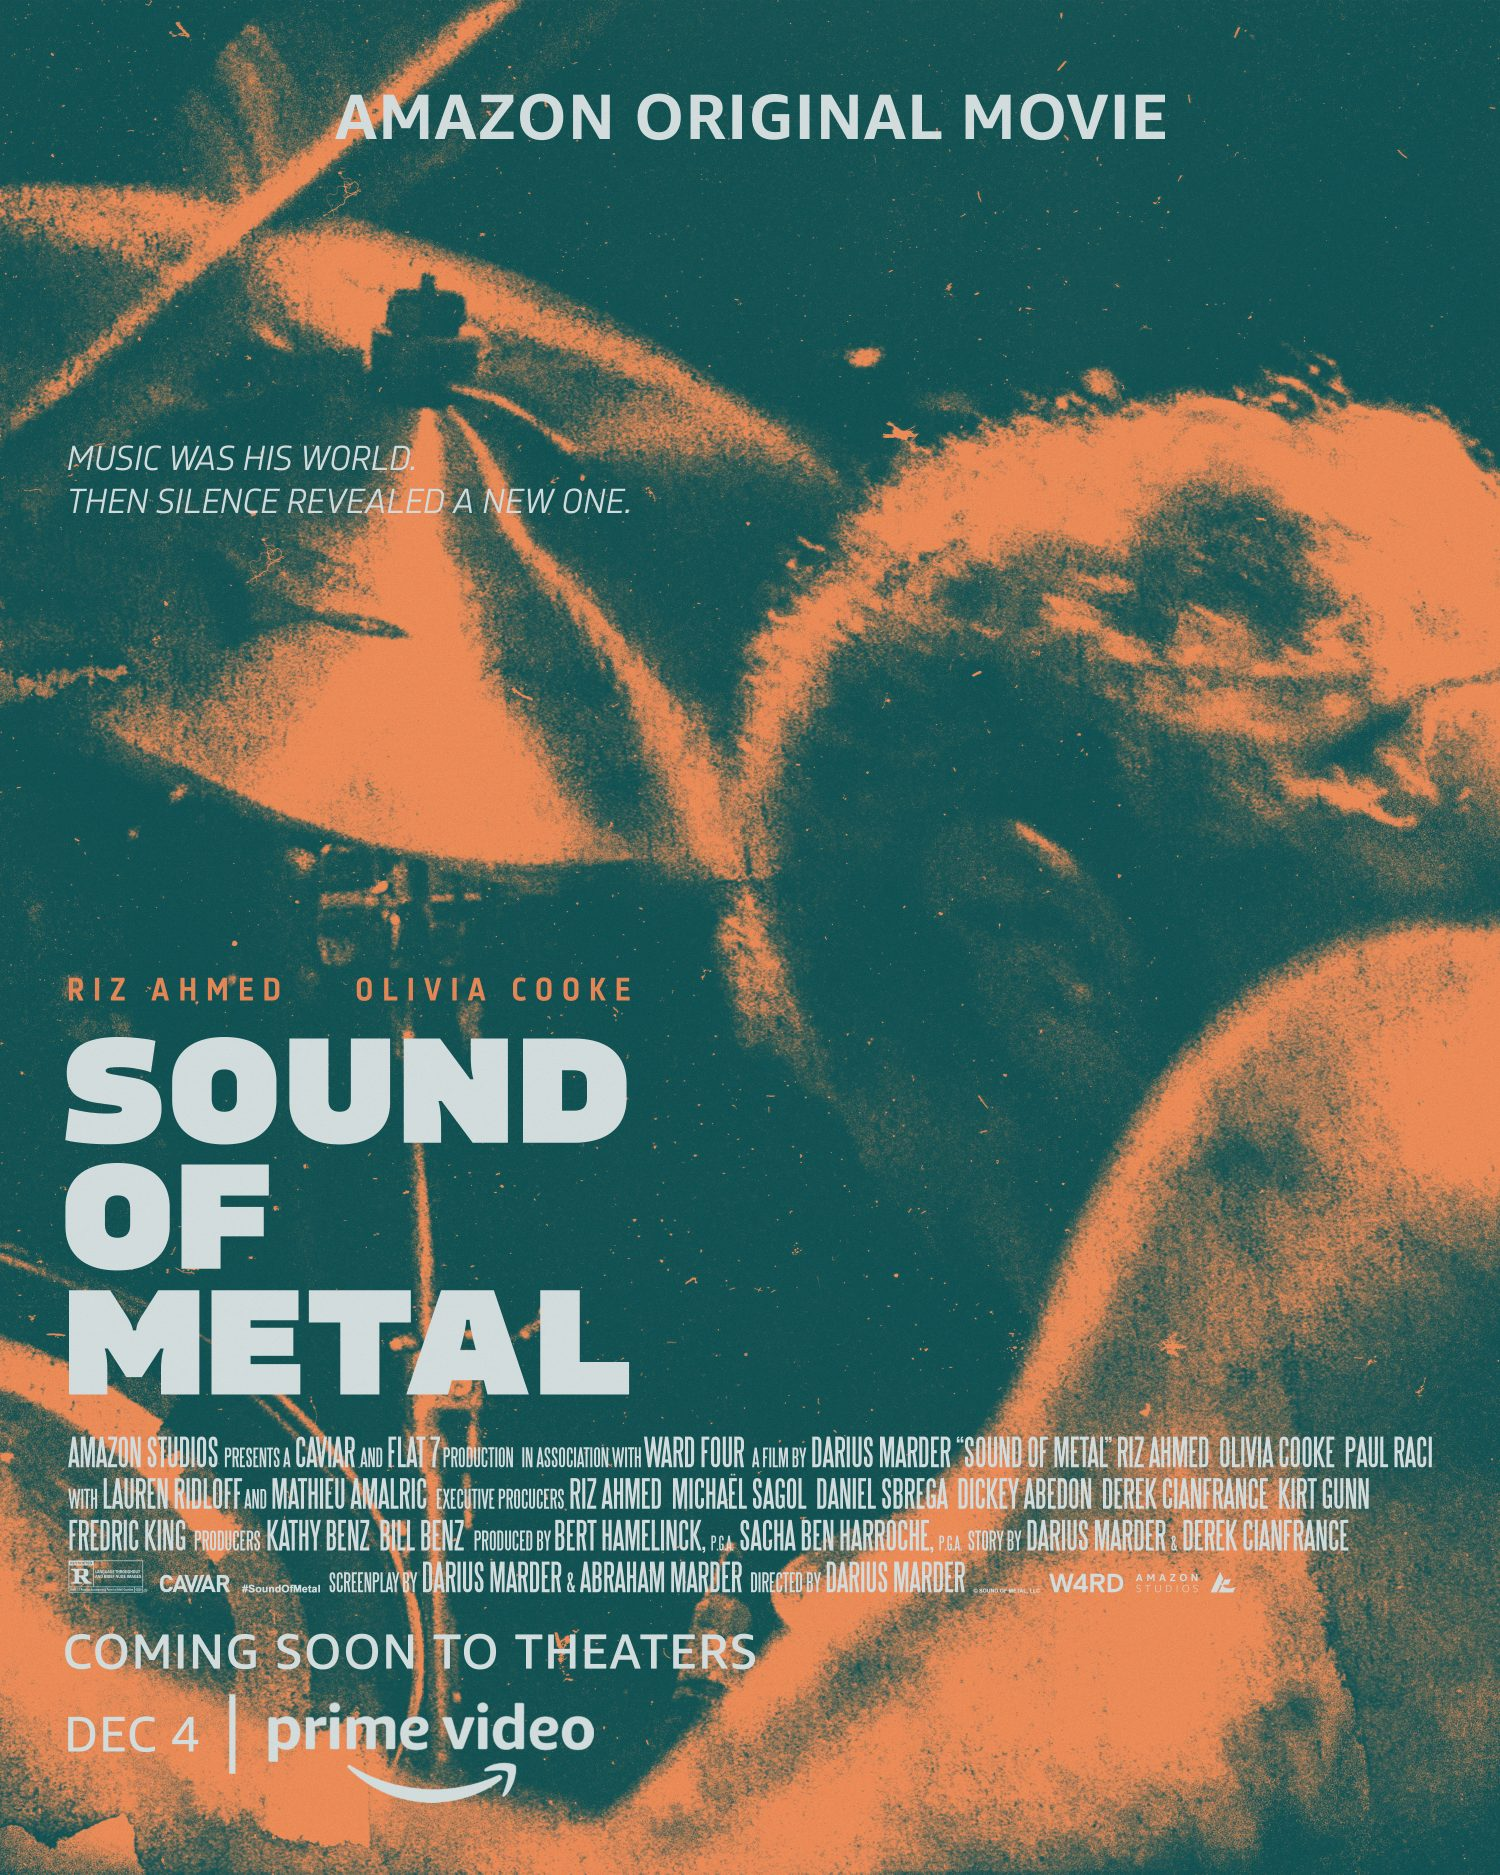 SOUND-OF-METAL-HIGH-RES-1500x1875.jpg